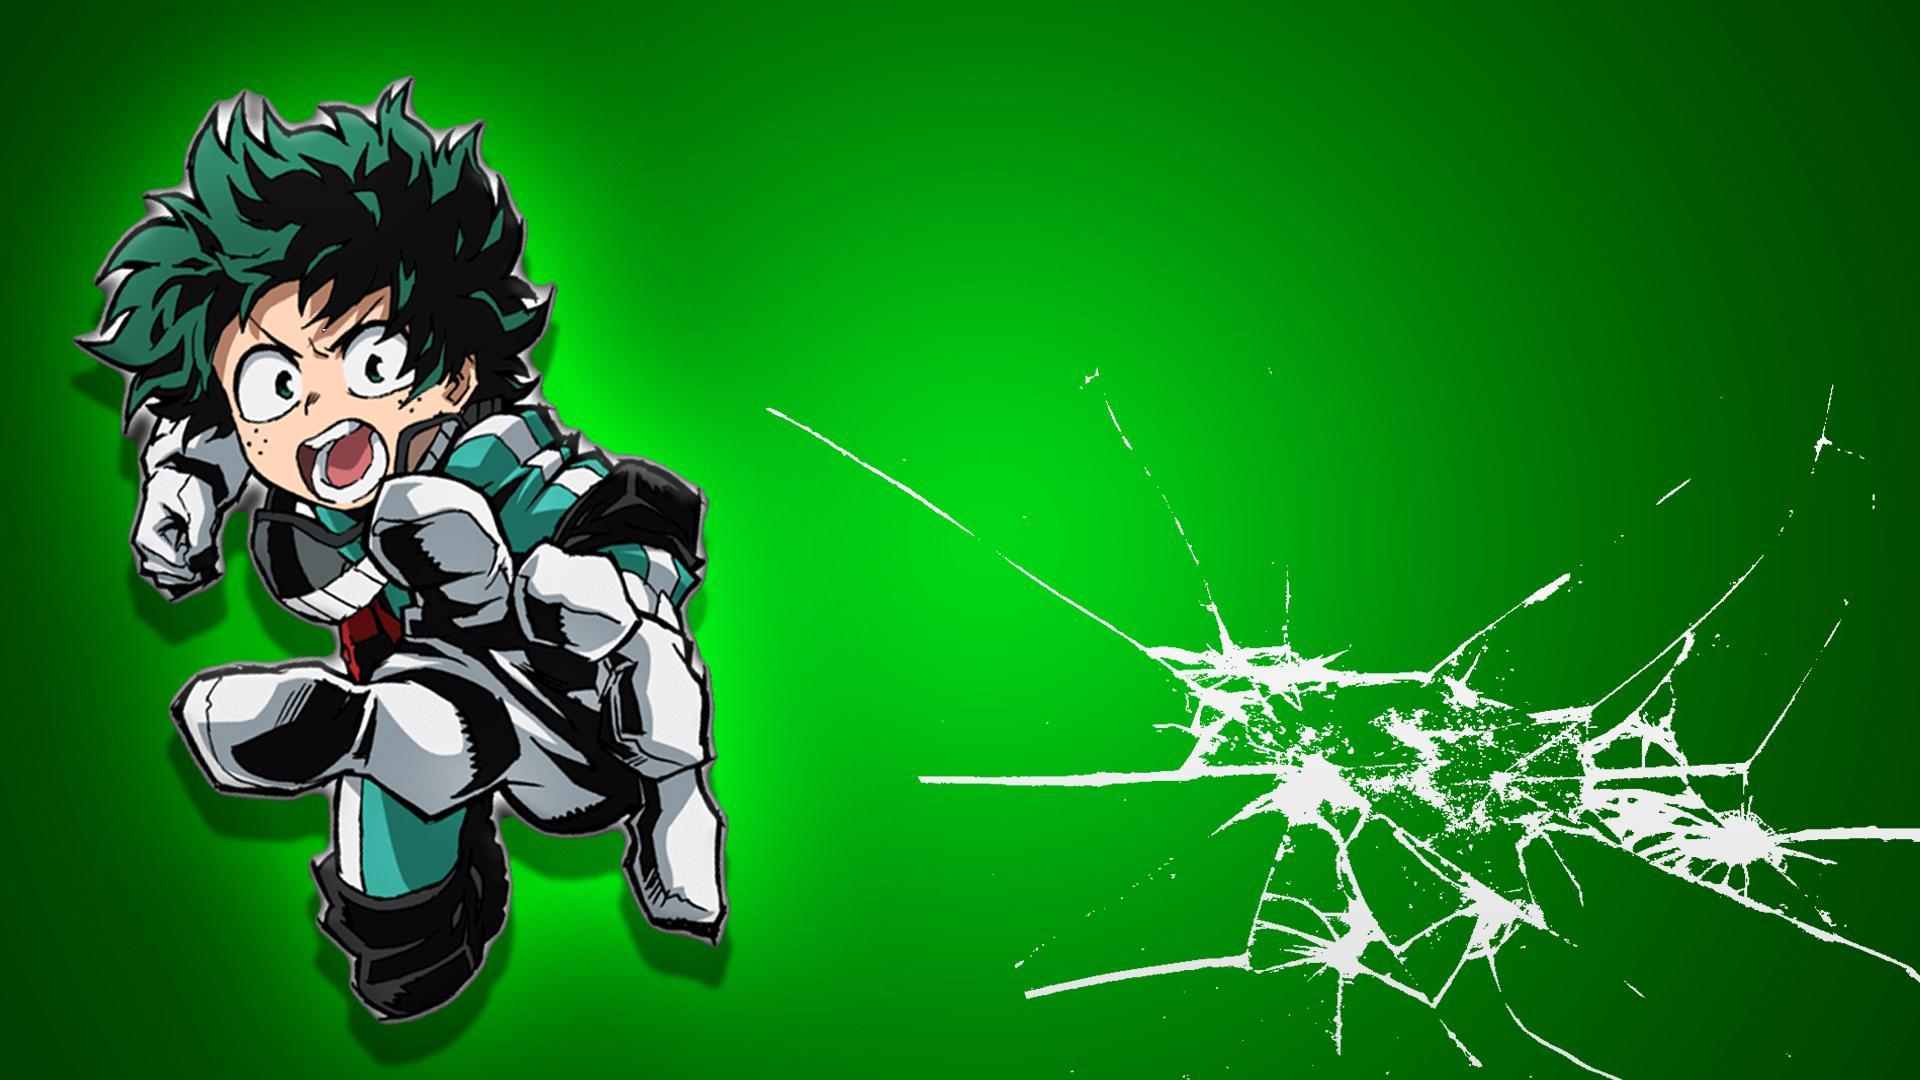 Izuku midoriya bnha boku no 4k #4790b. My Hero Academia Deku Wallpapers - Top Free My Hero ...